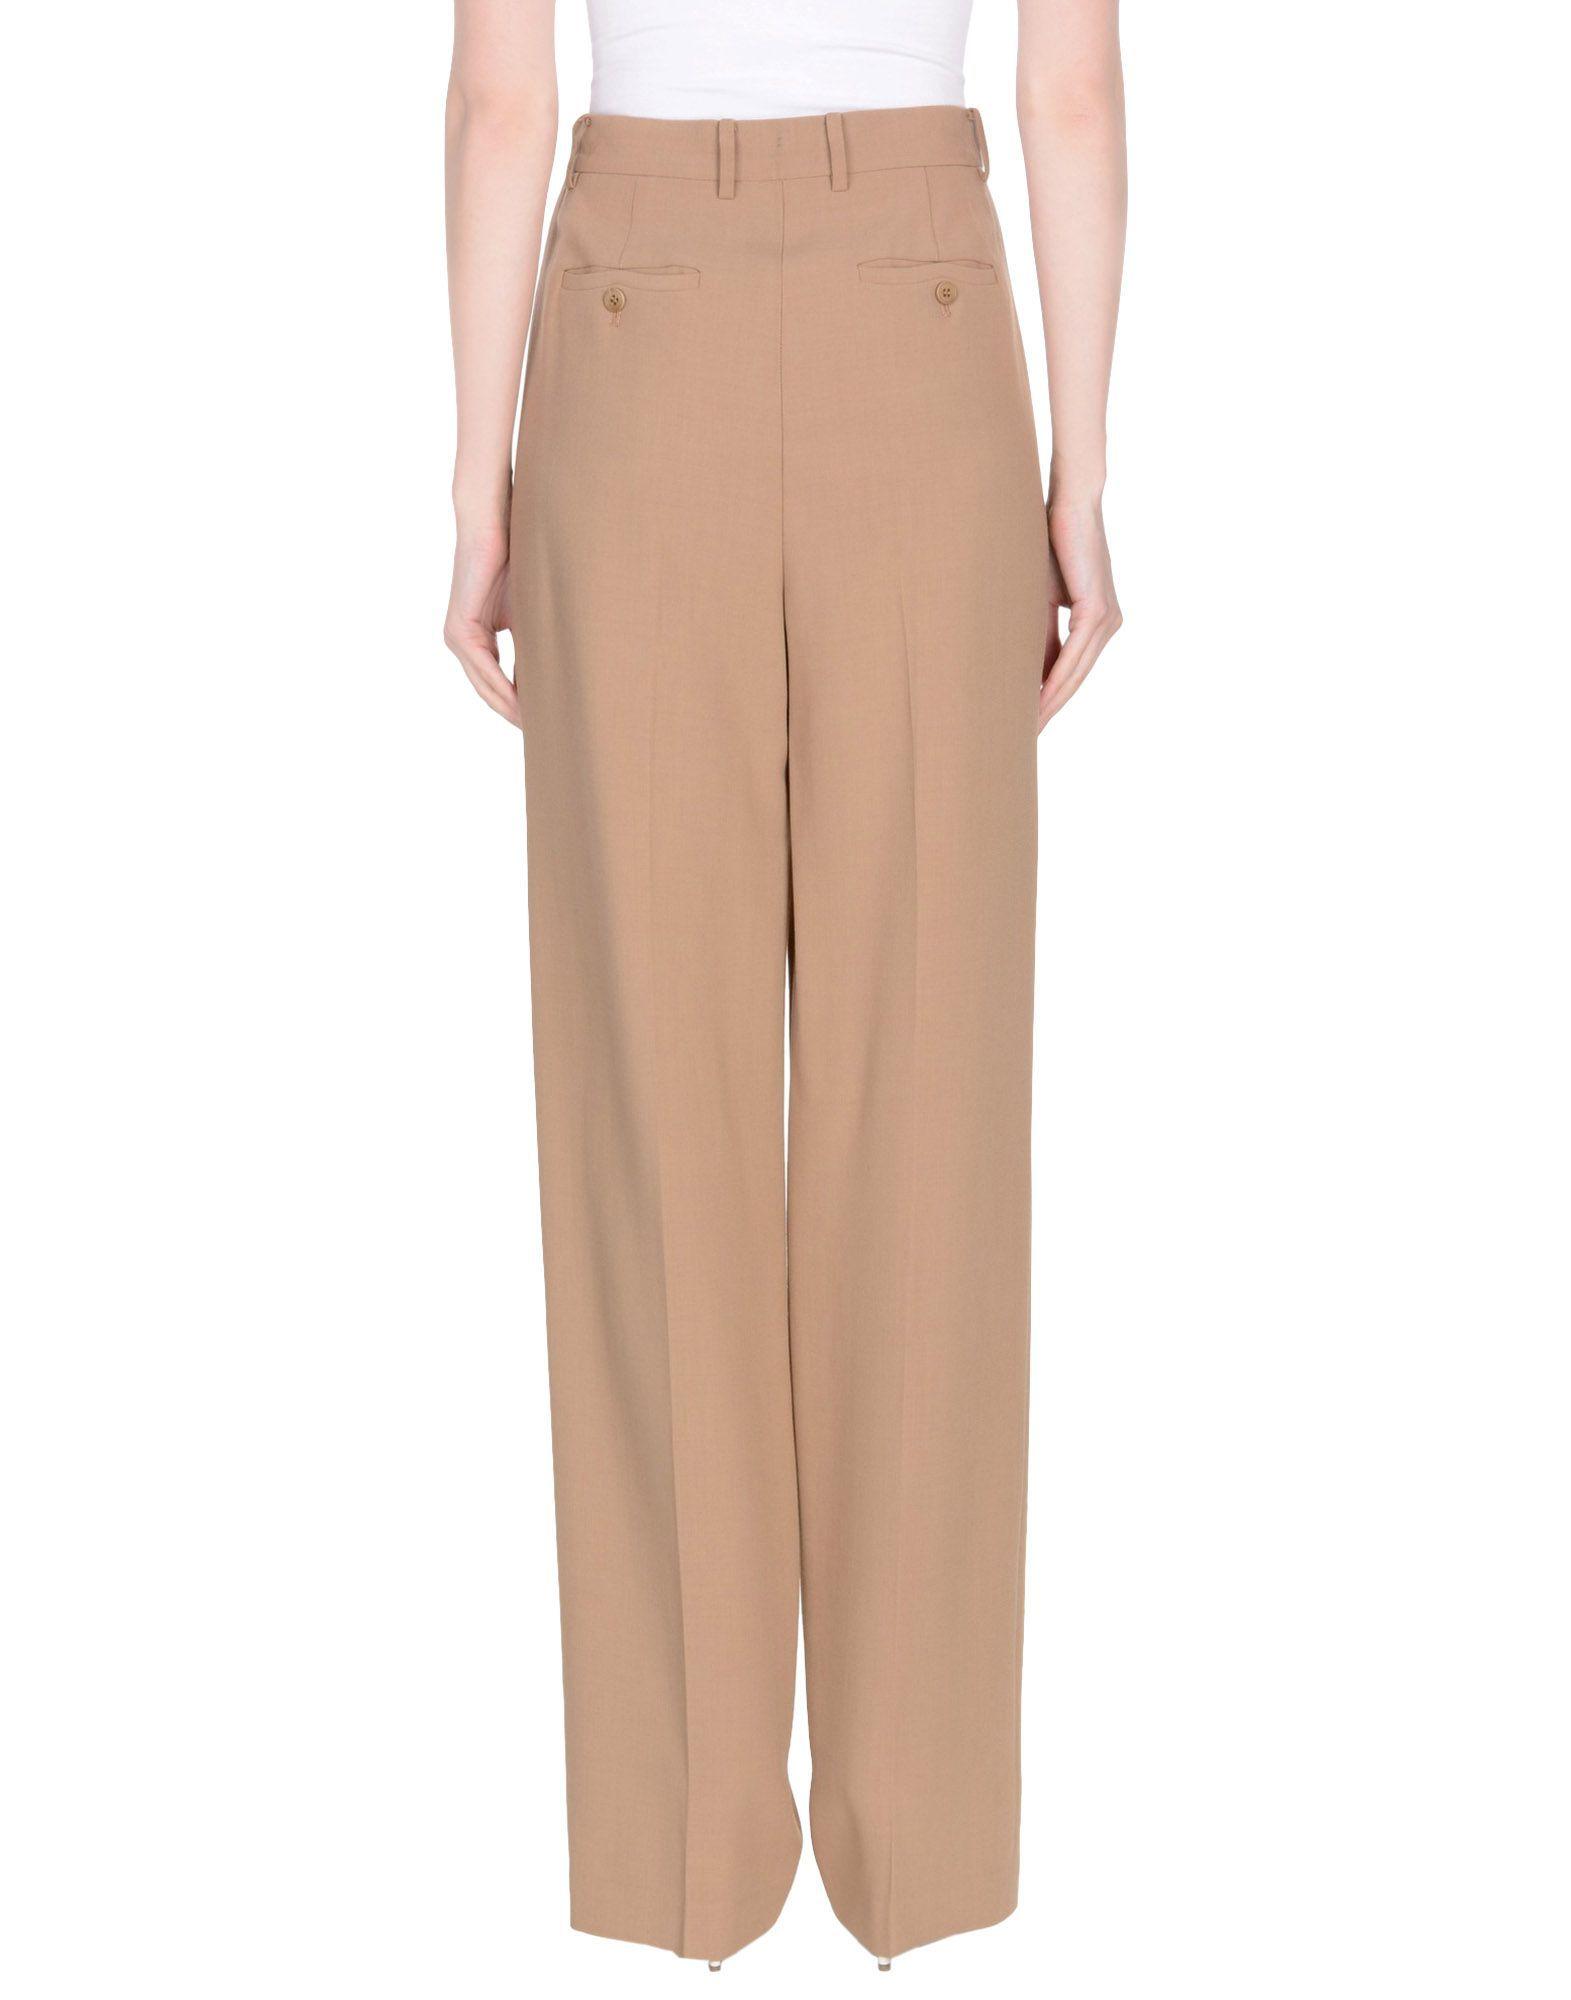 Theory Khaki Tailored Trousers